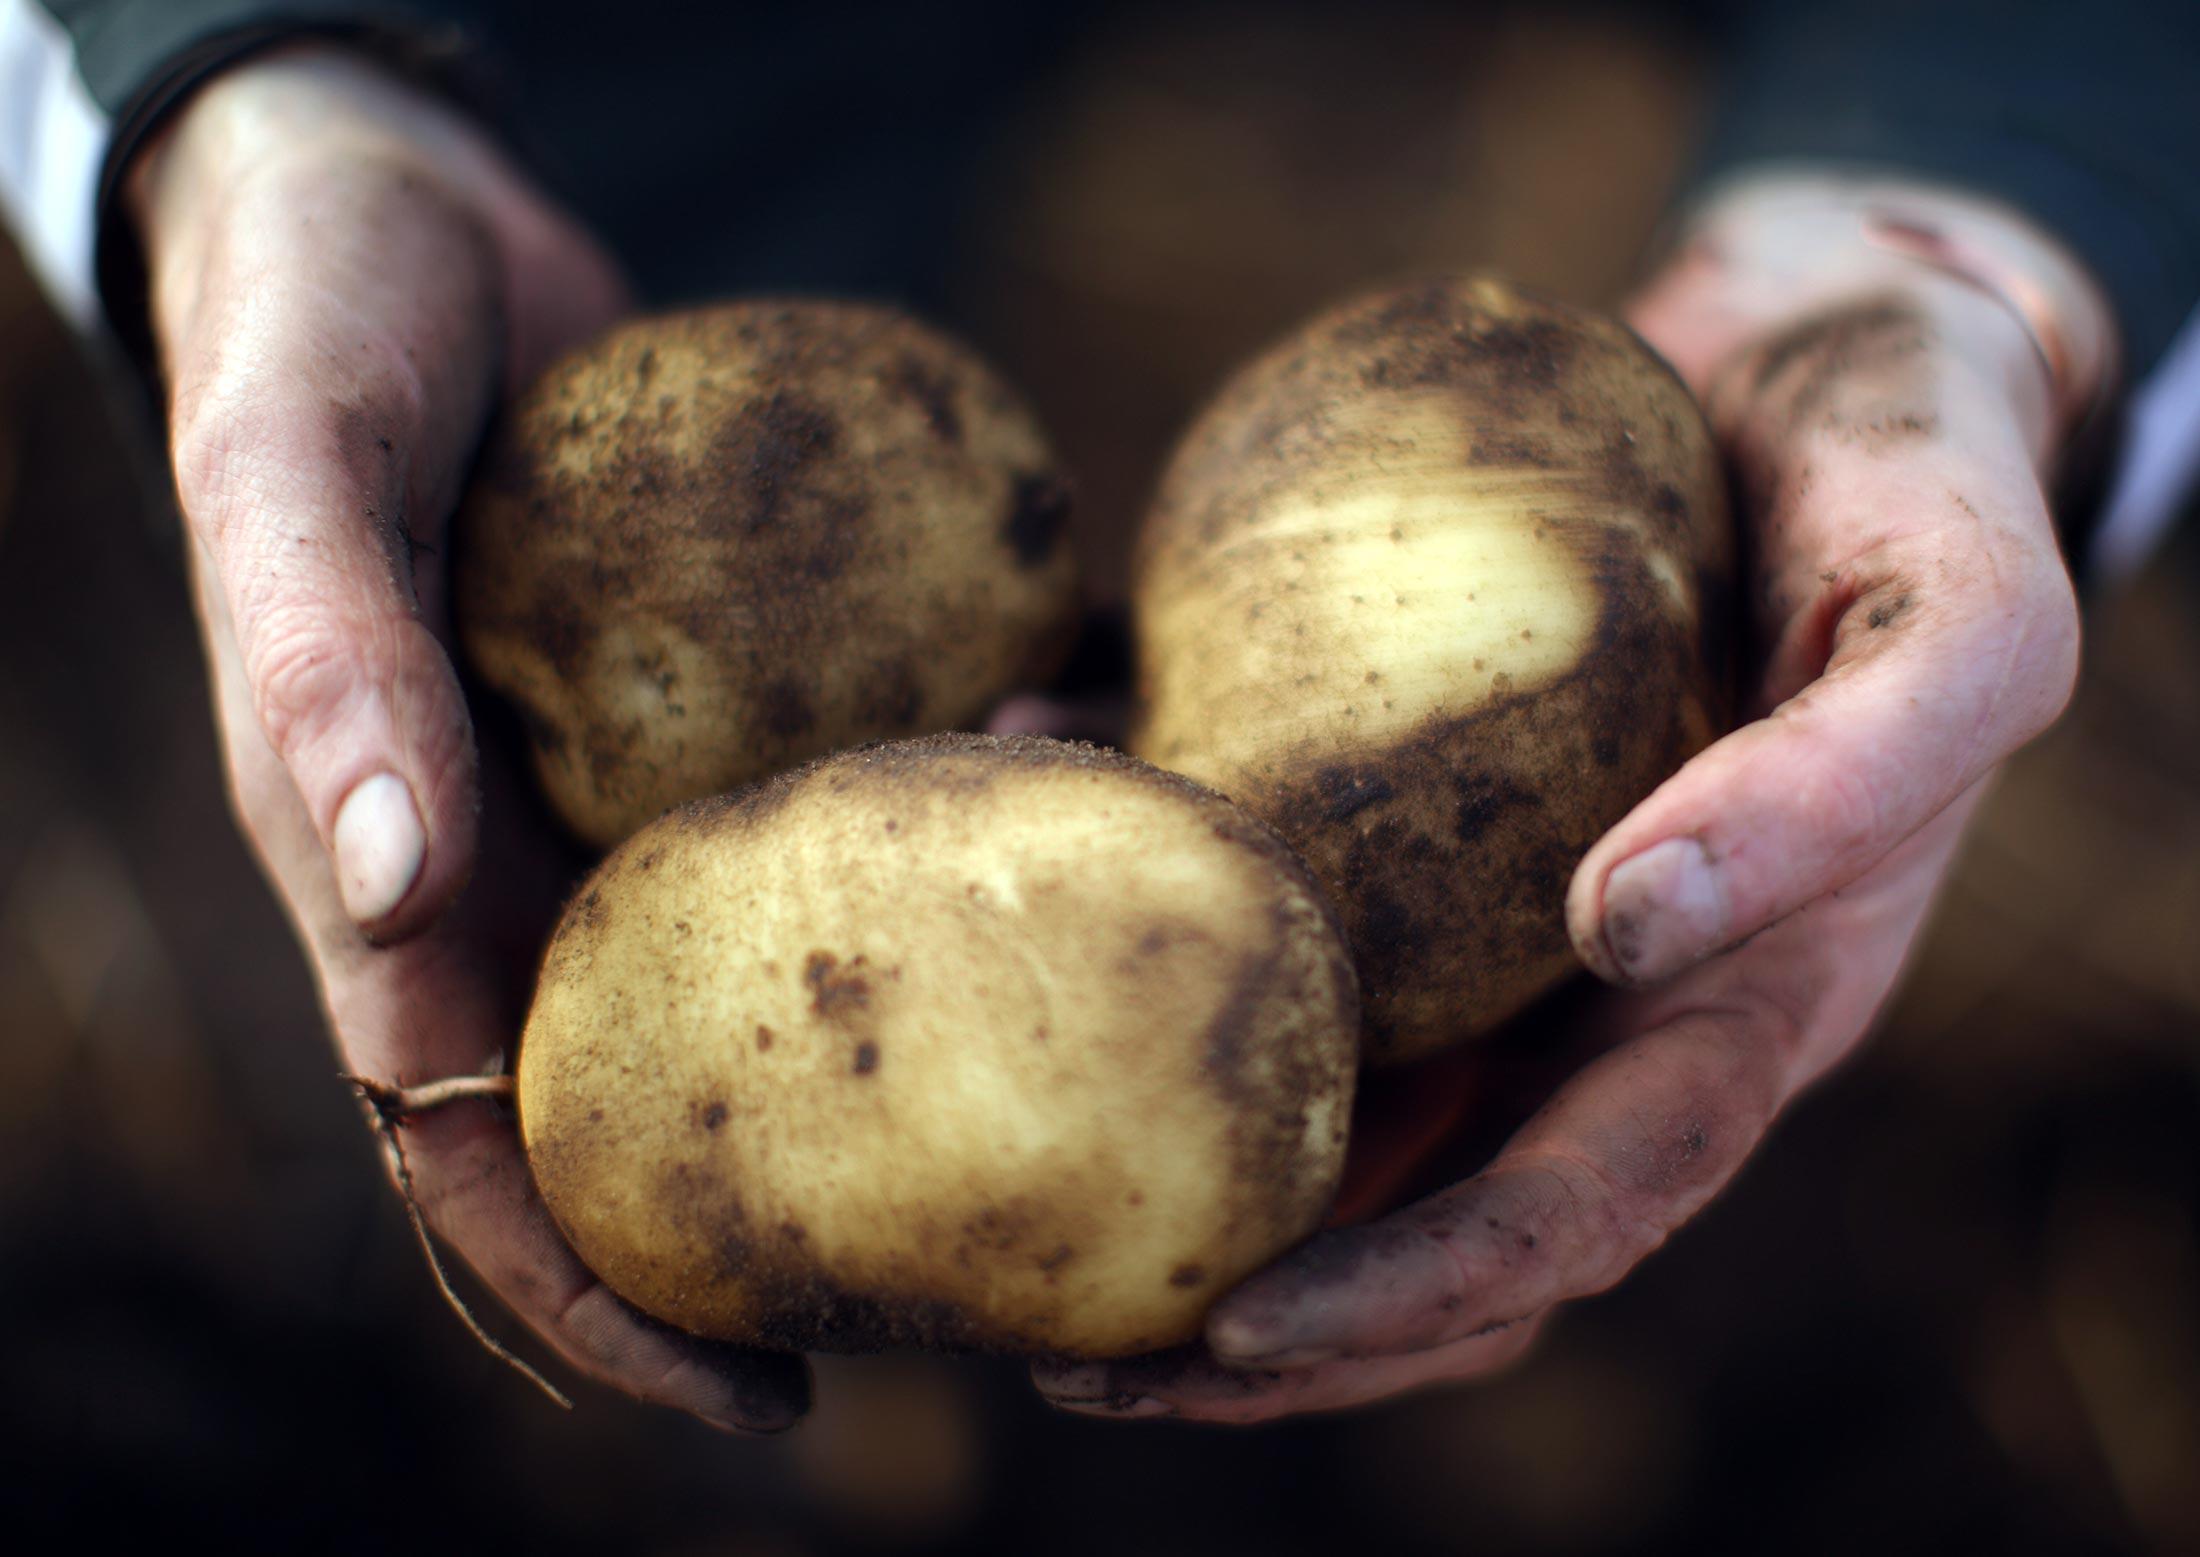 bloomberg.com - Mara Bernath - Swiss Bid for Sustainable Food May Run It Into Trade Trouble